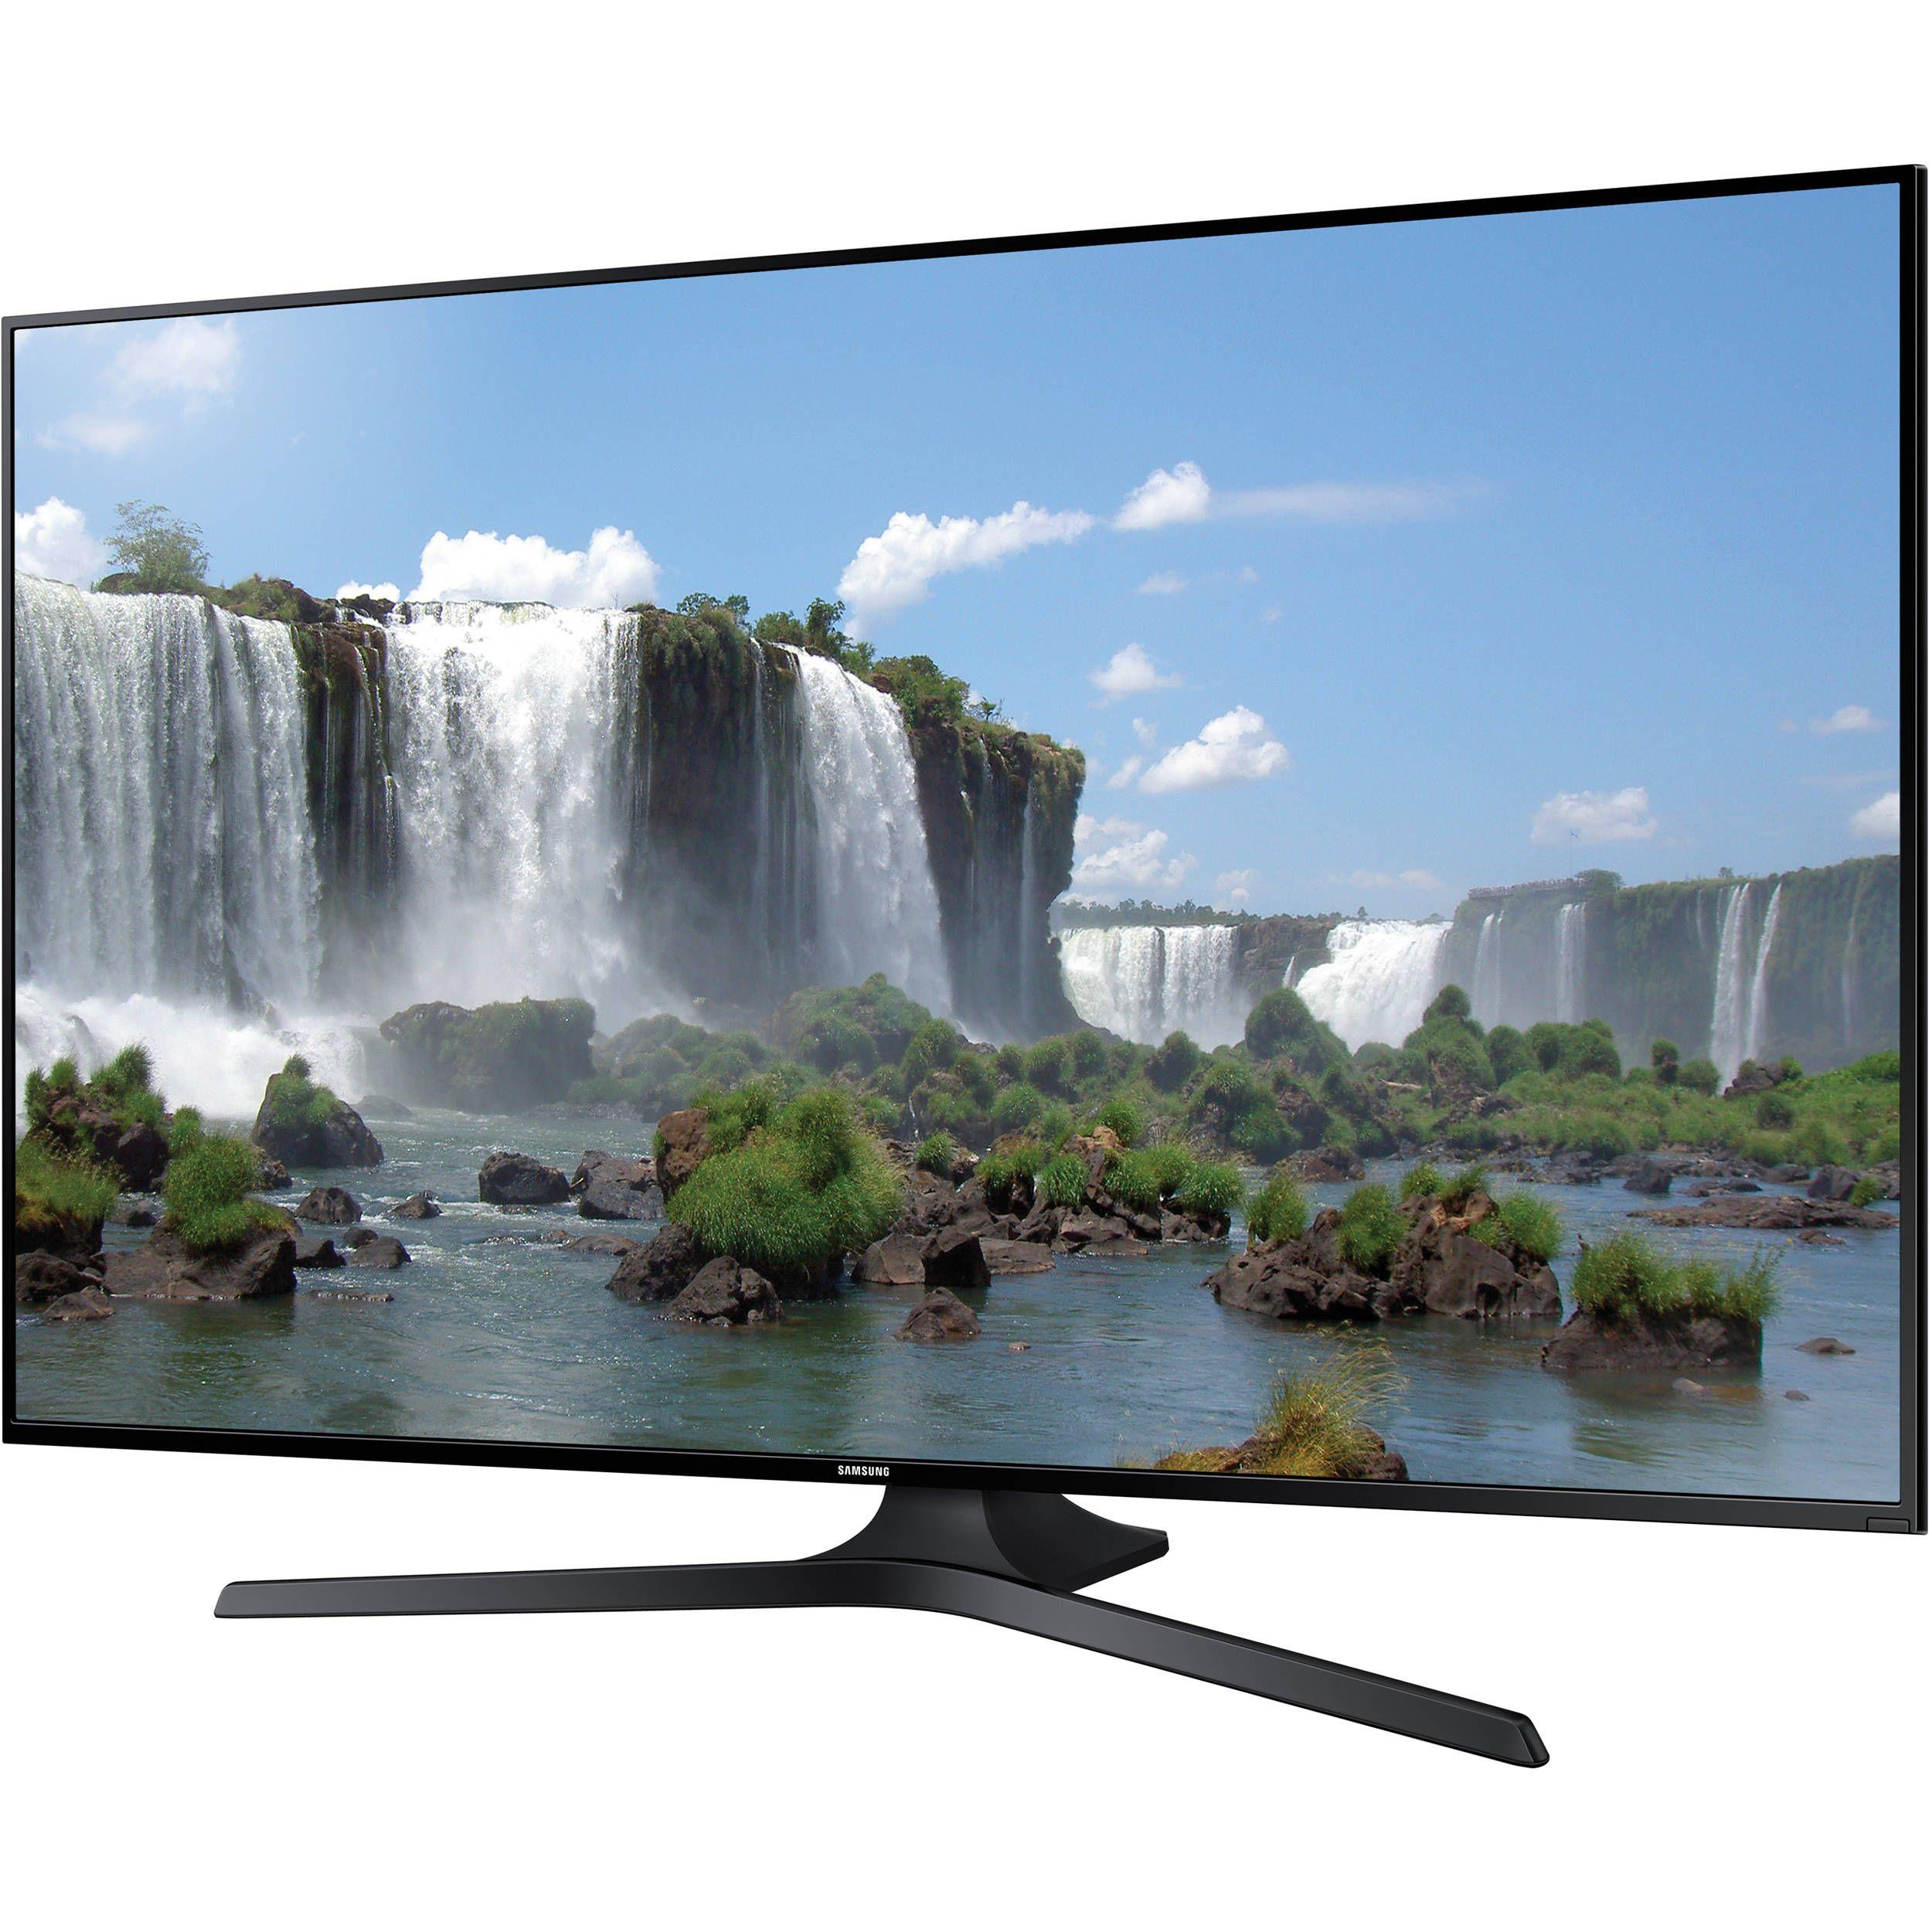 Samsung J6300 60 Class Full Hd Smart Led Tv Samsung Tvs Smart